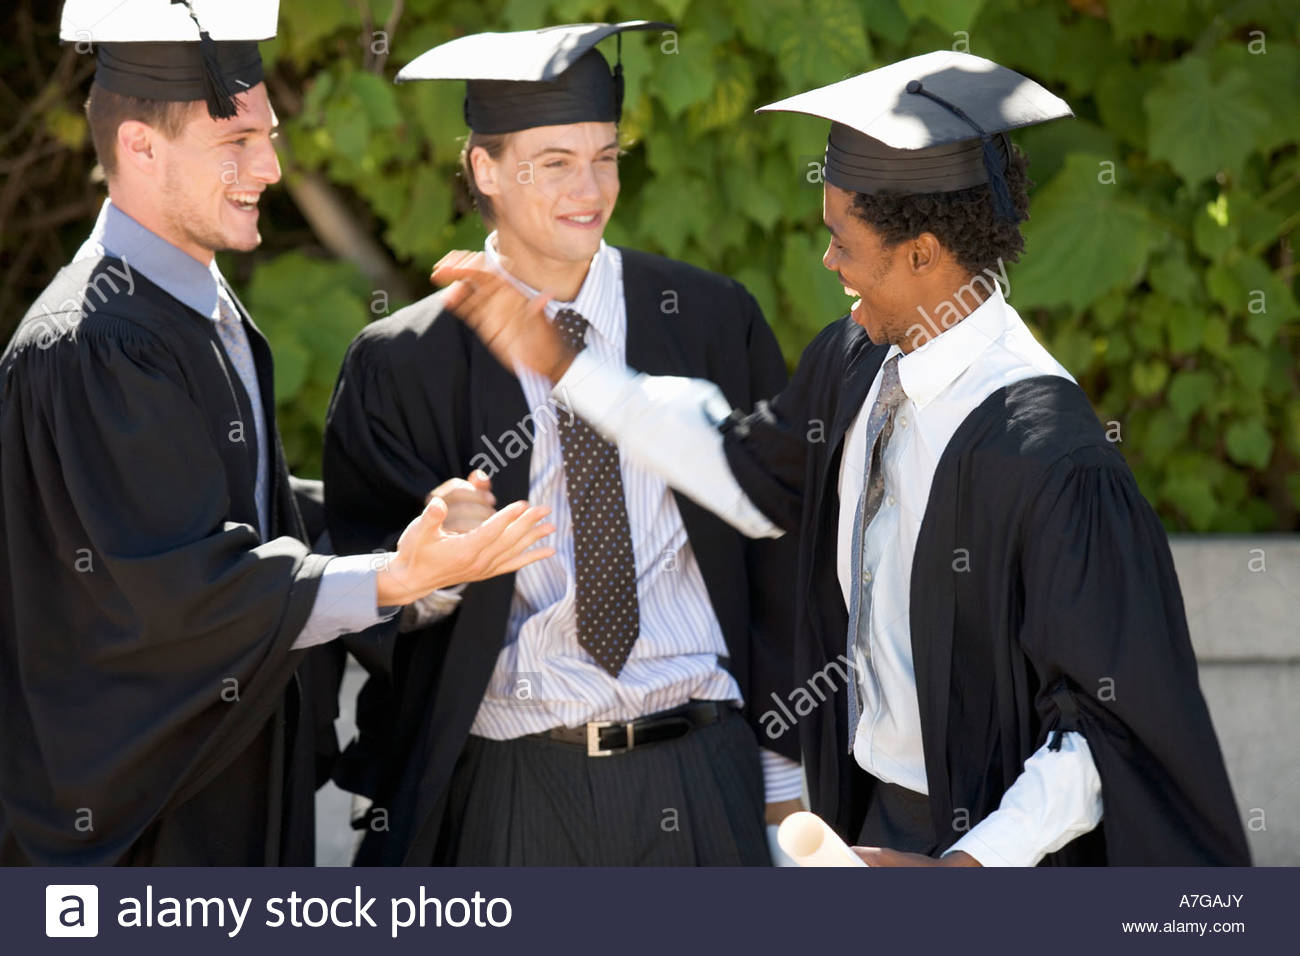 Three graduates celebrating - Stock Image